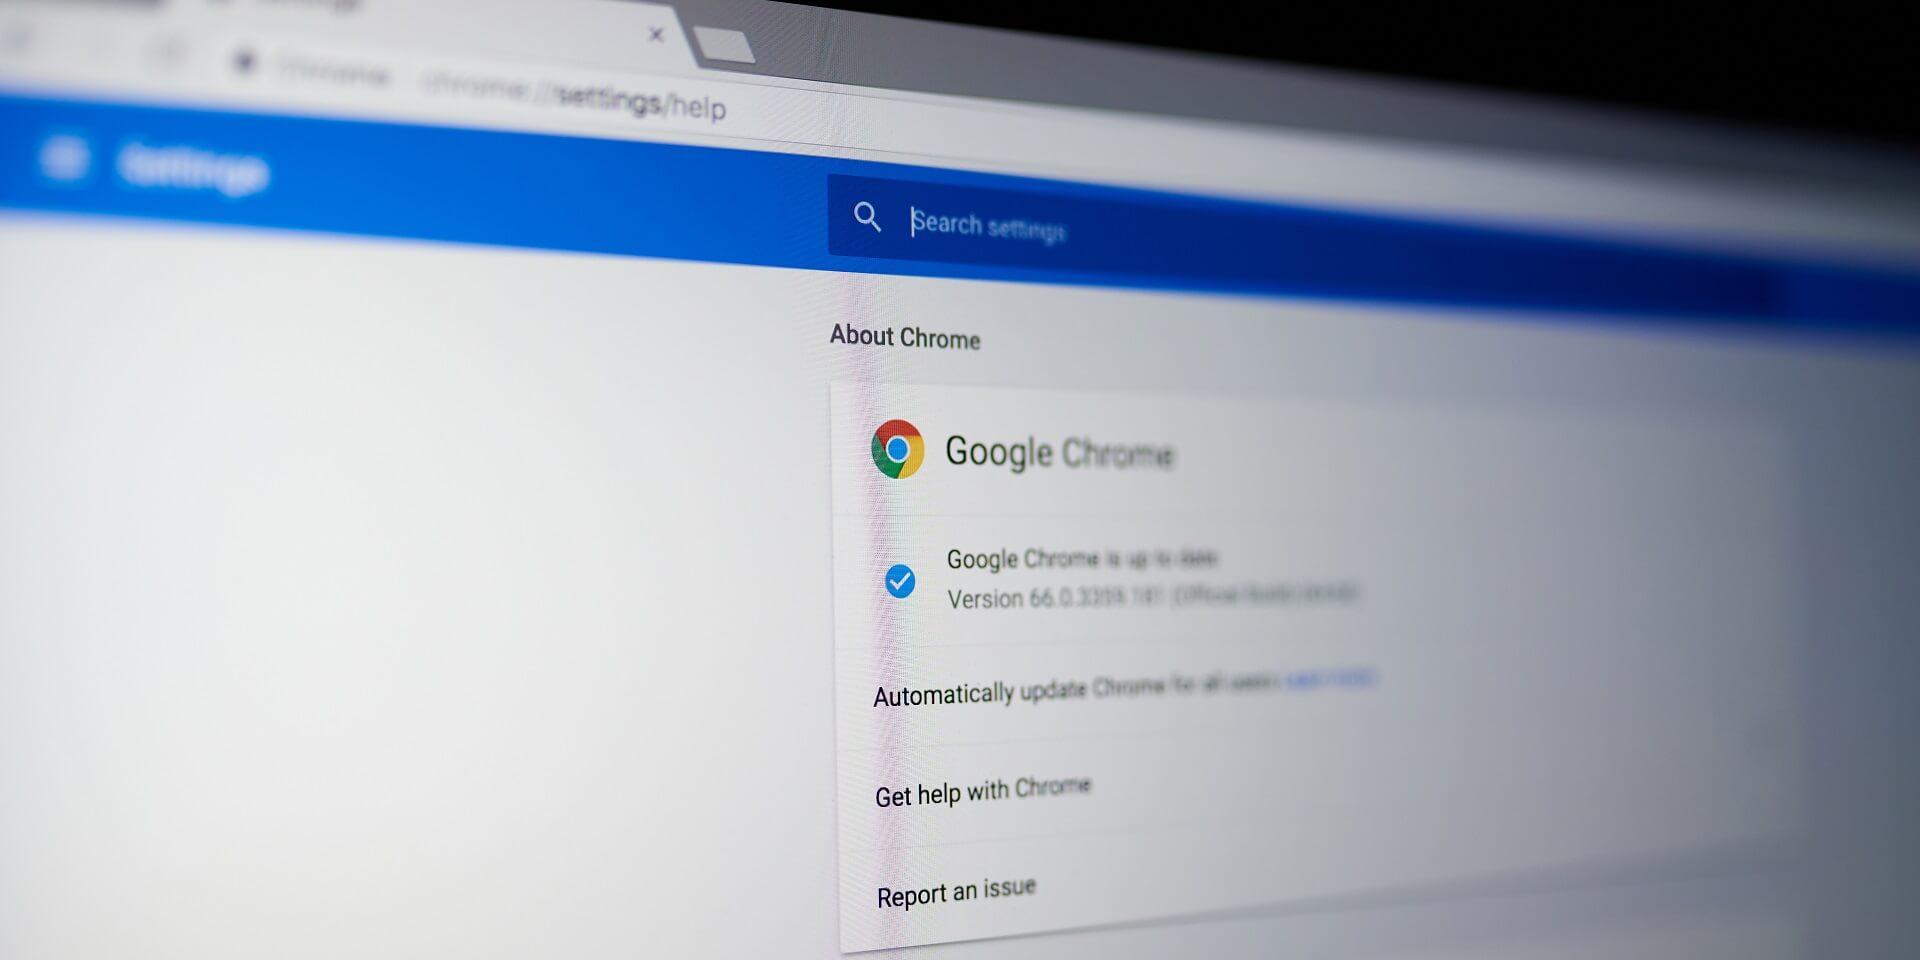 Digital Marketing Firms Hate Google's Anti-Cookie Initiative | Tech.co